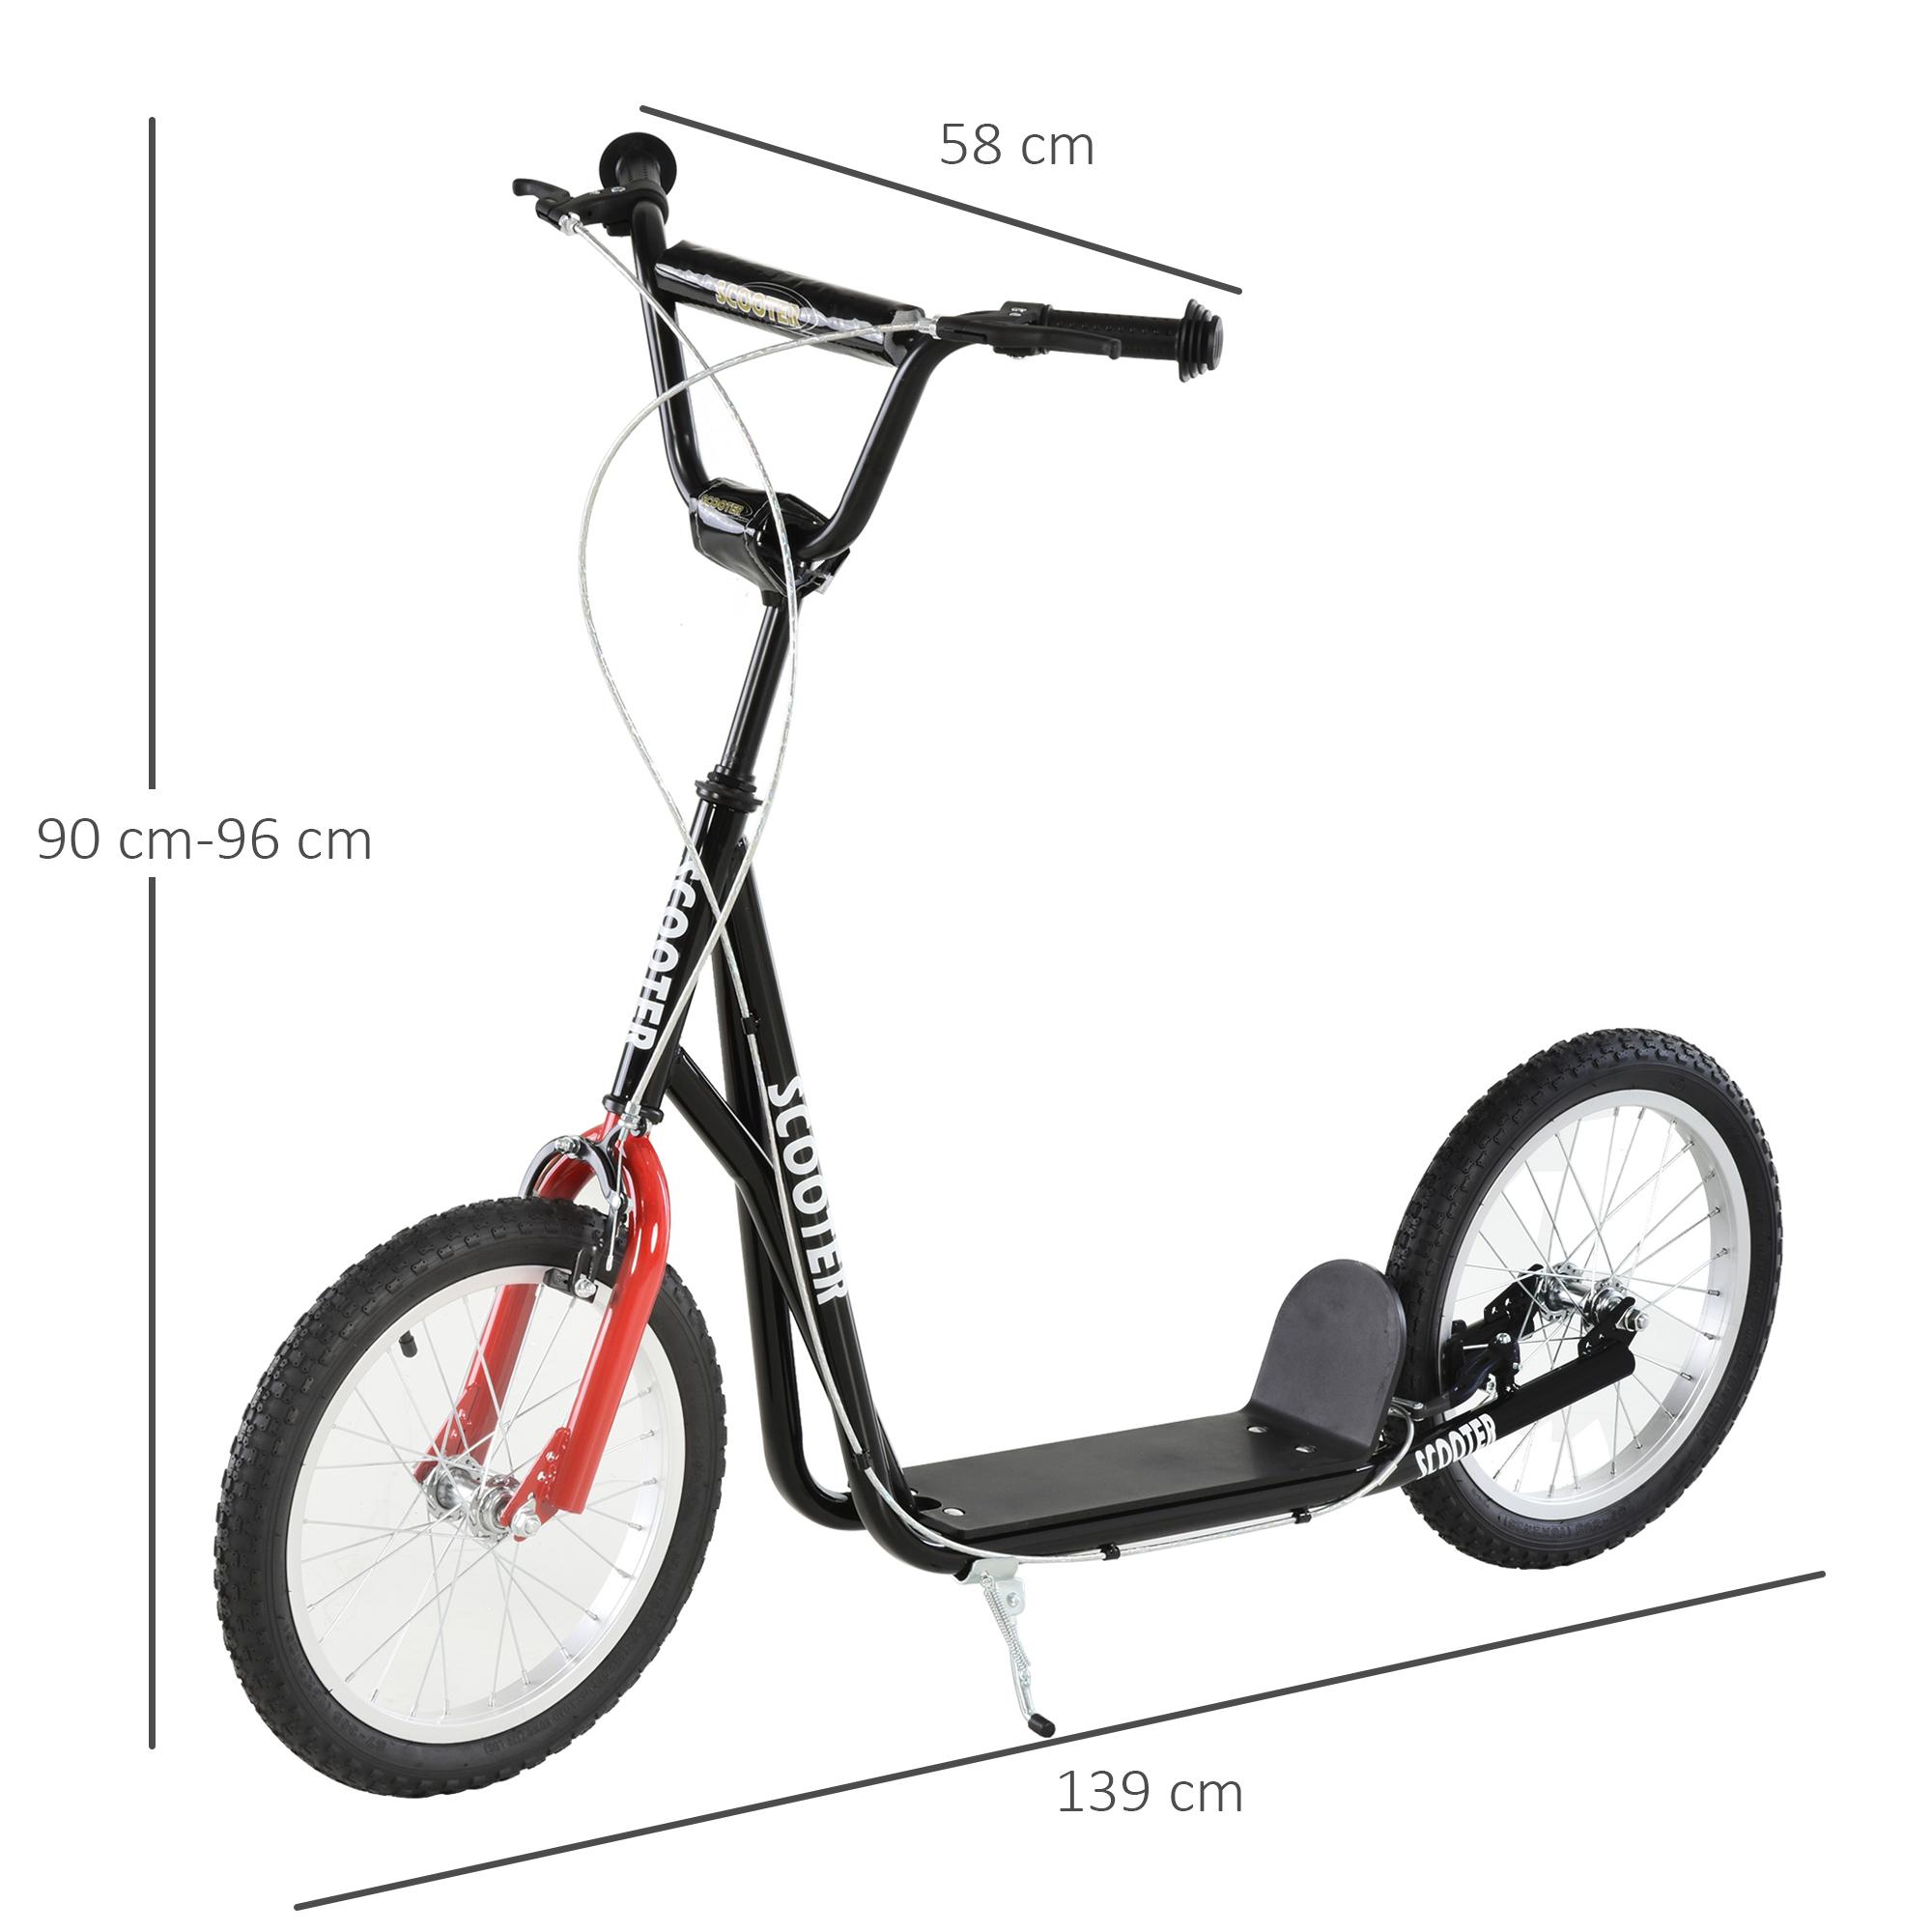 Indexbild 35 - HOMCOM-Tretroller-Kinderroller-Scooter-Cityroller-Roller-verstellbar-Blau-Gruen